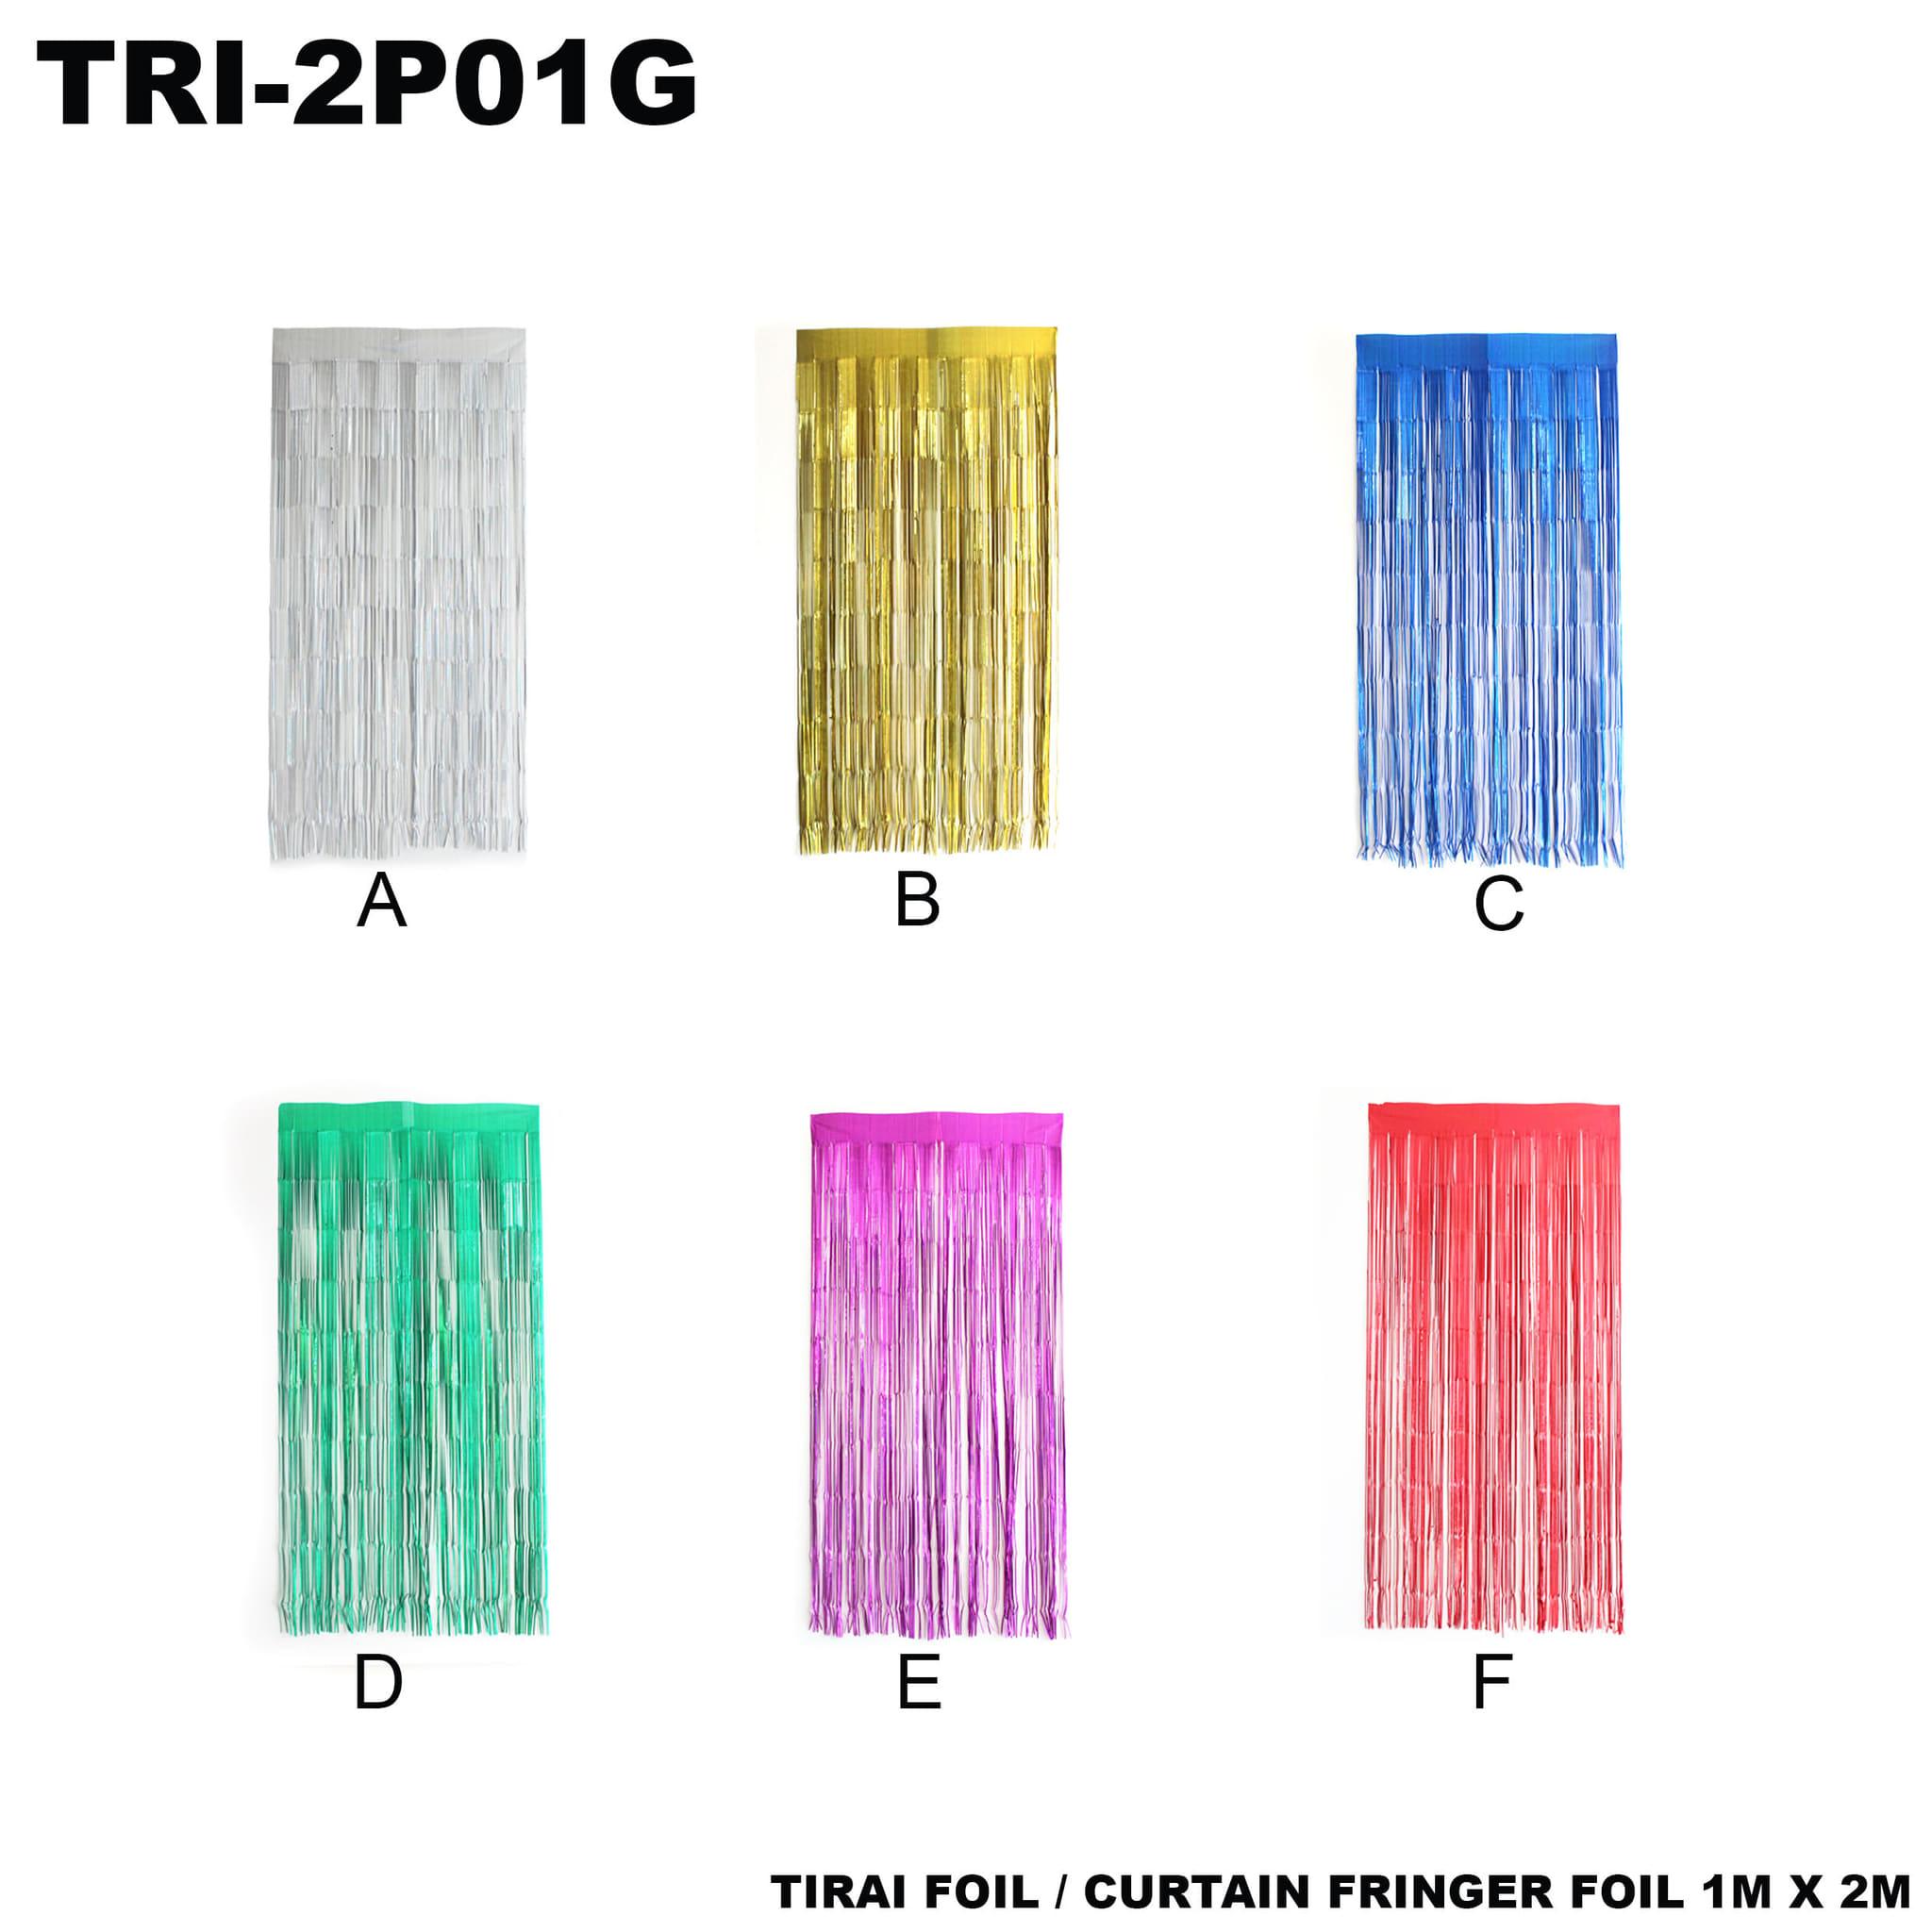 Jual Tirai Foil Curtain Fringer 1m X 2m Yoberionline Backdrop Tokopedia